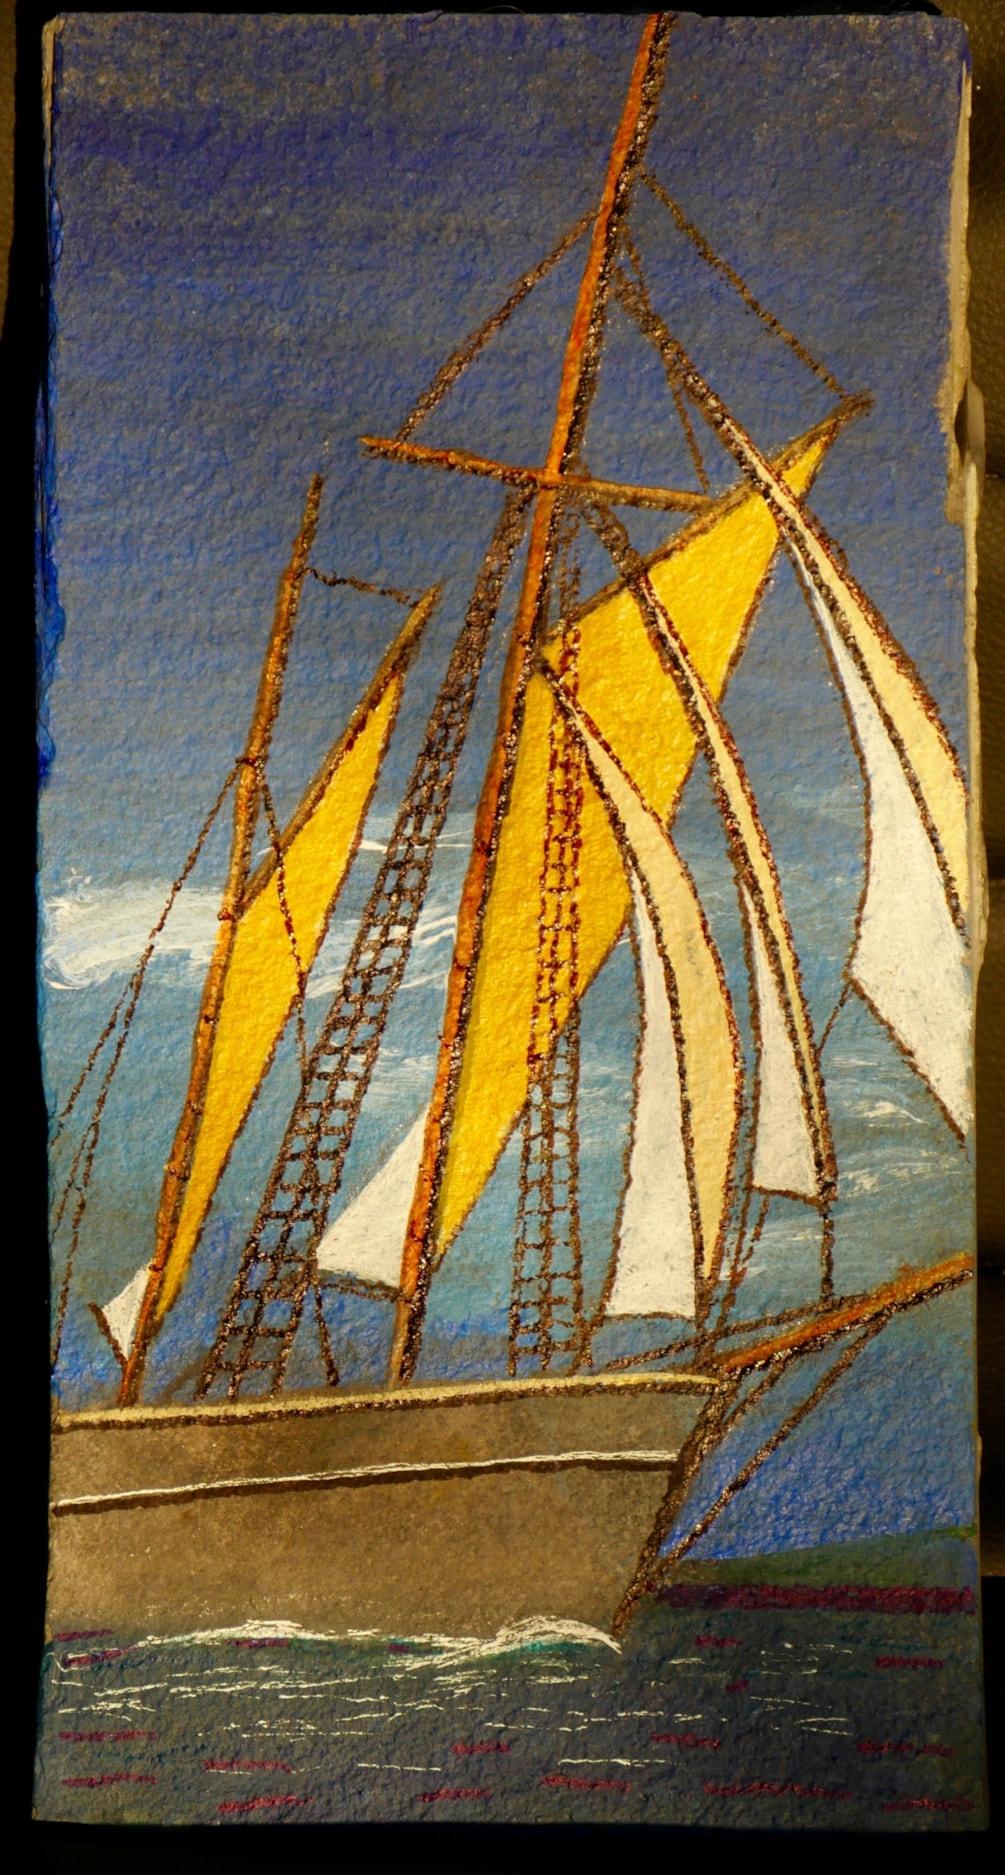 Boat on Slate